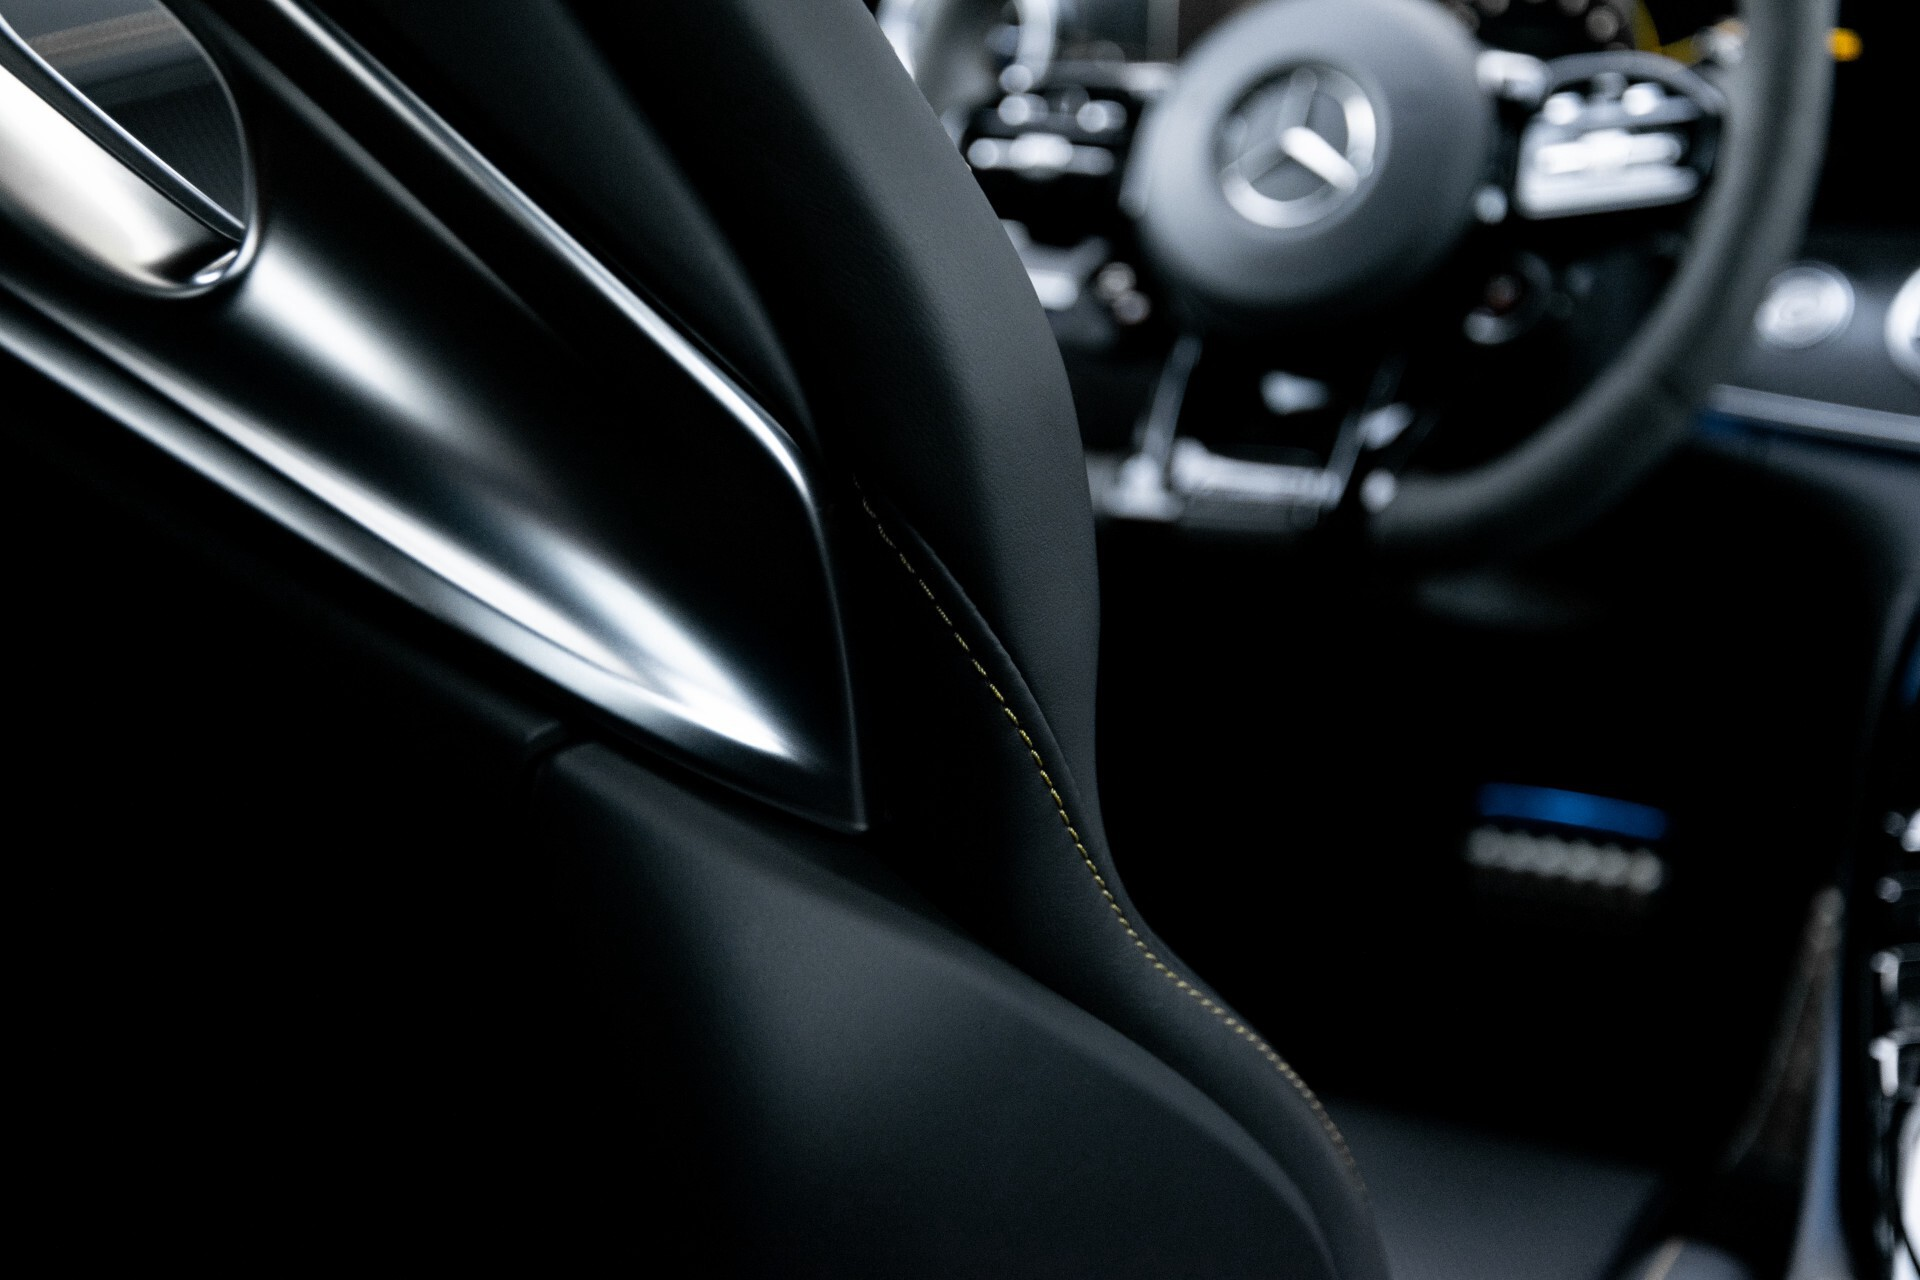 Mercedes-Benz AMG GT 4-Door Coupe 63 S 4MATIC+ Edition 1 Keramisch/Carbon/First Class/Dynamic Plus/Burmester High End 3D Aut9 Foto 62